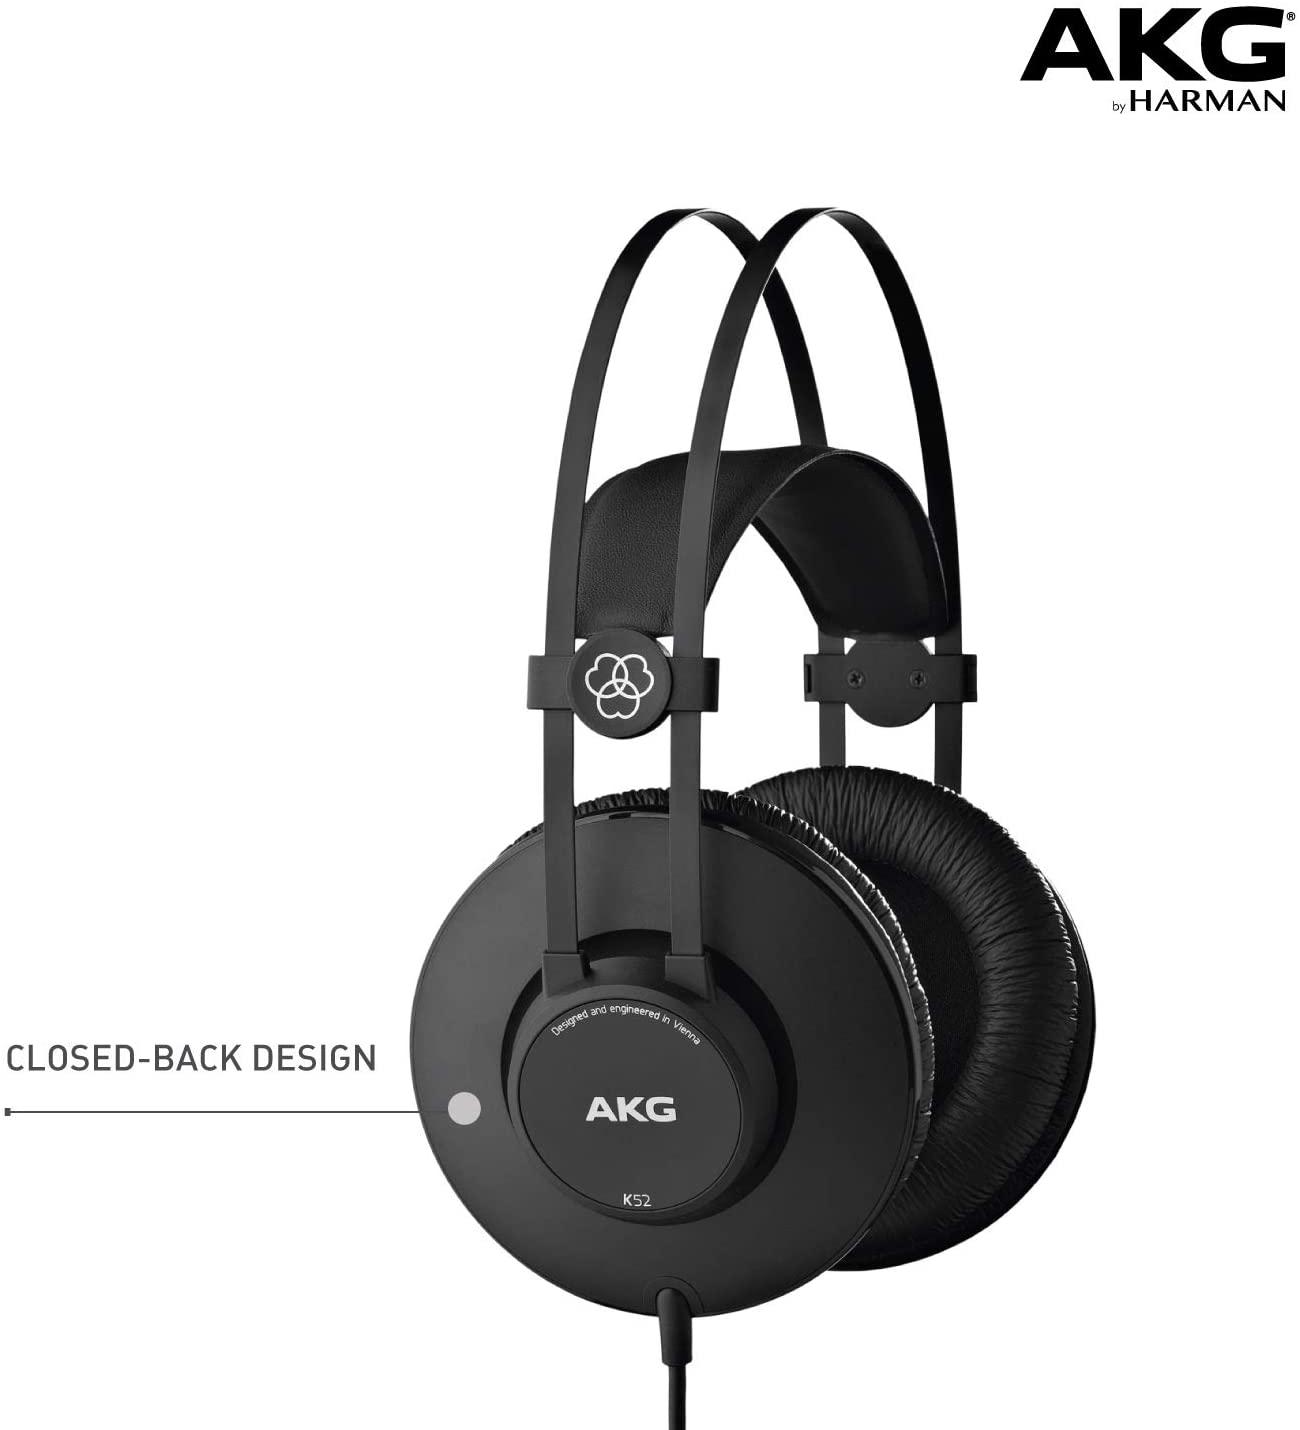 FONE DE OUVIDO AKG K52 (28950427)